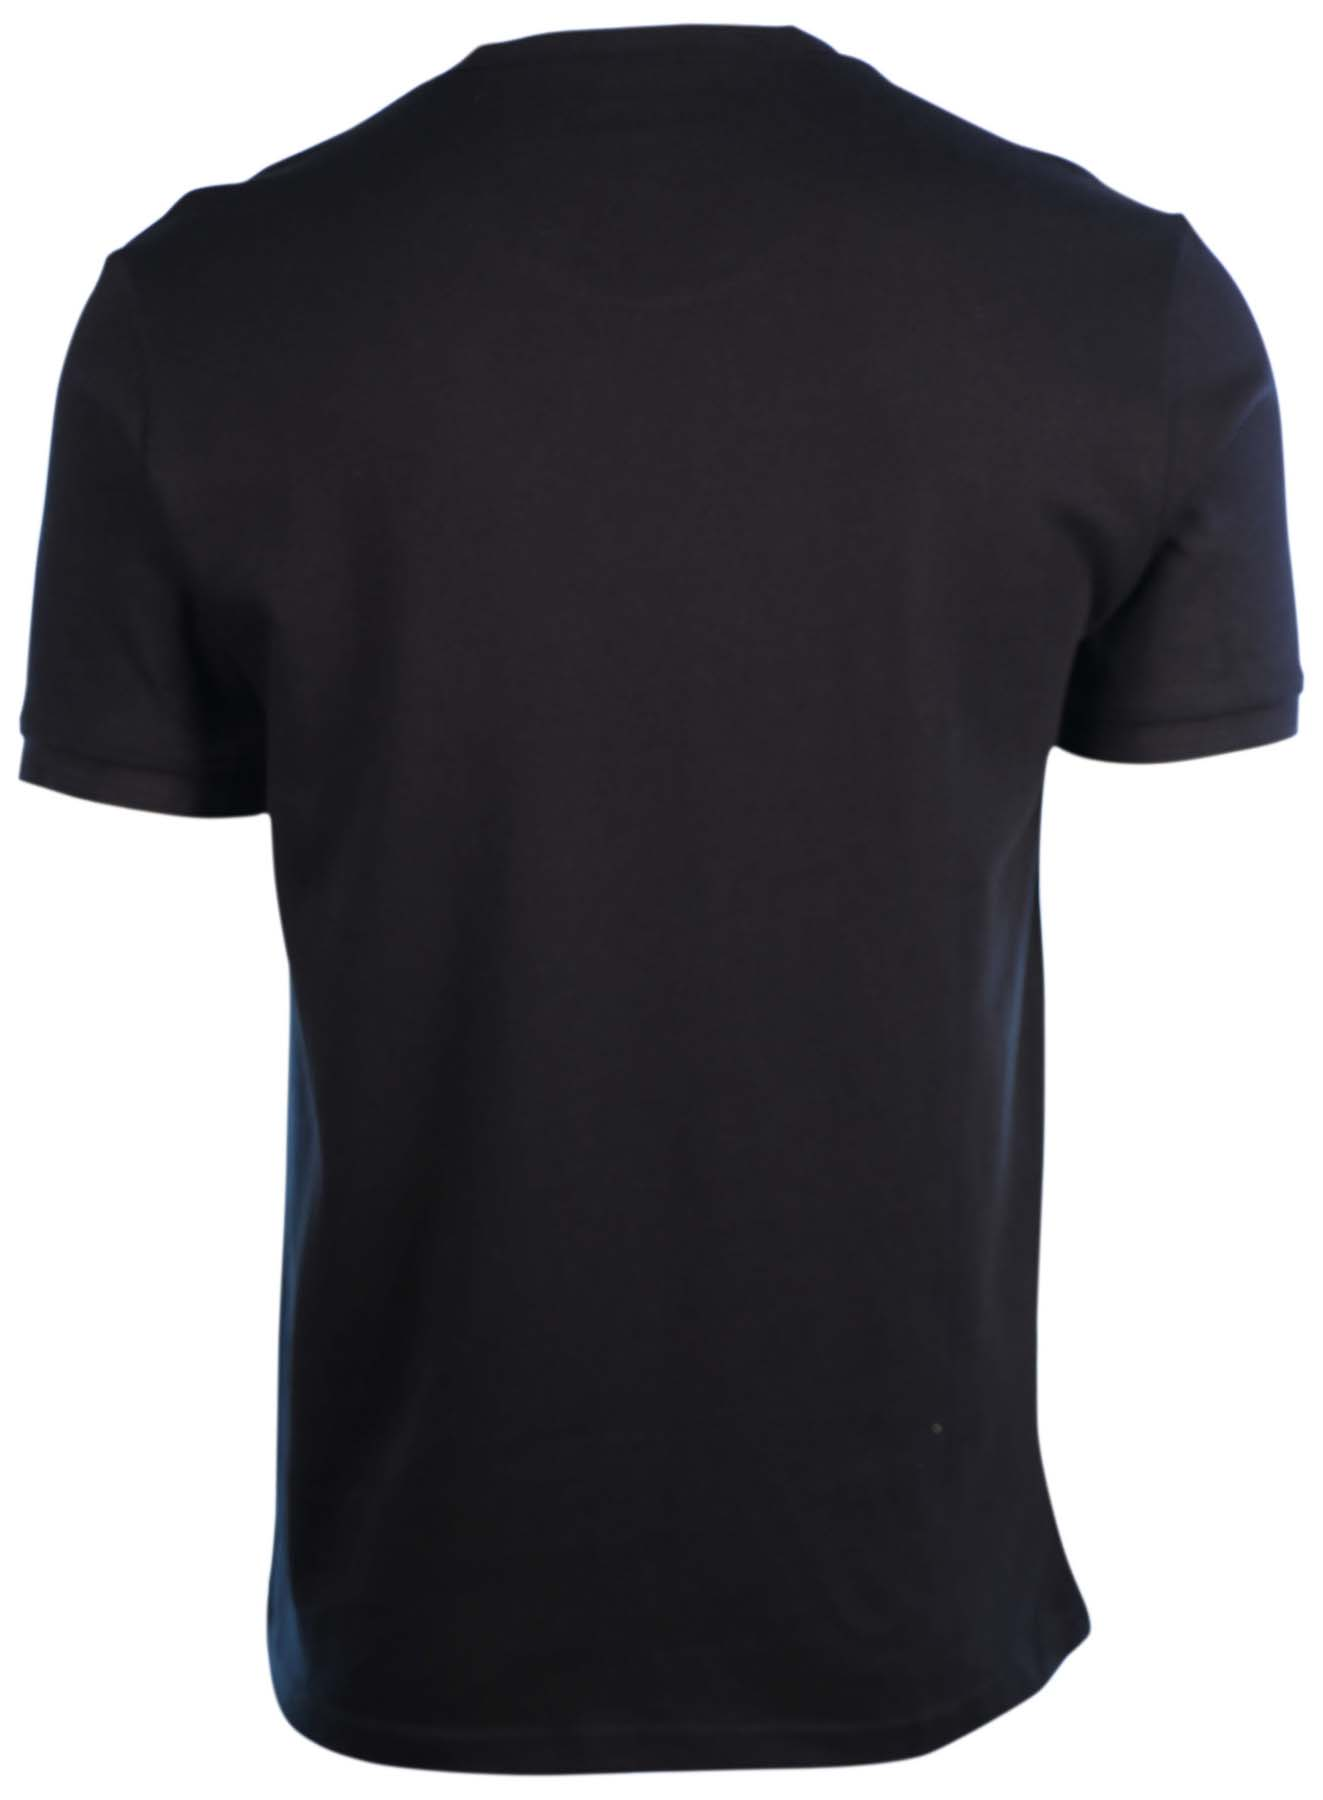 5d1994b0f1c328 Converse Men s Racked Ringer Chuck Taylor Casual Shirt